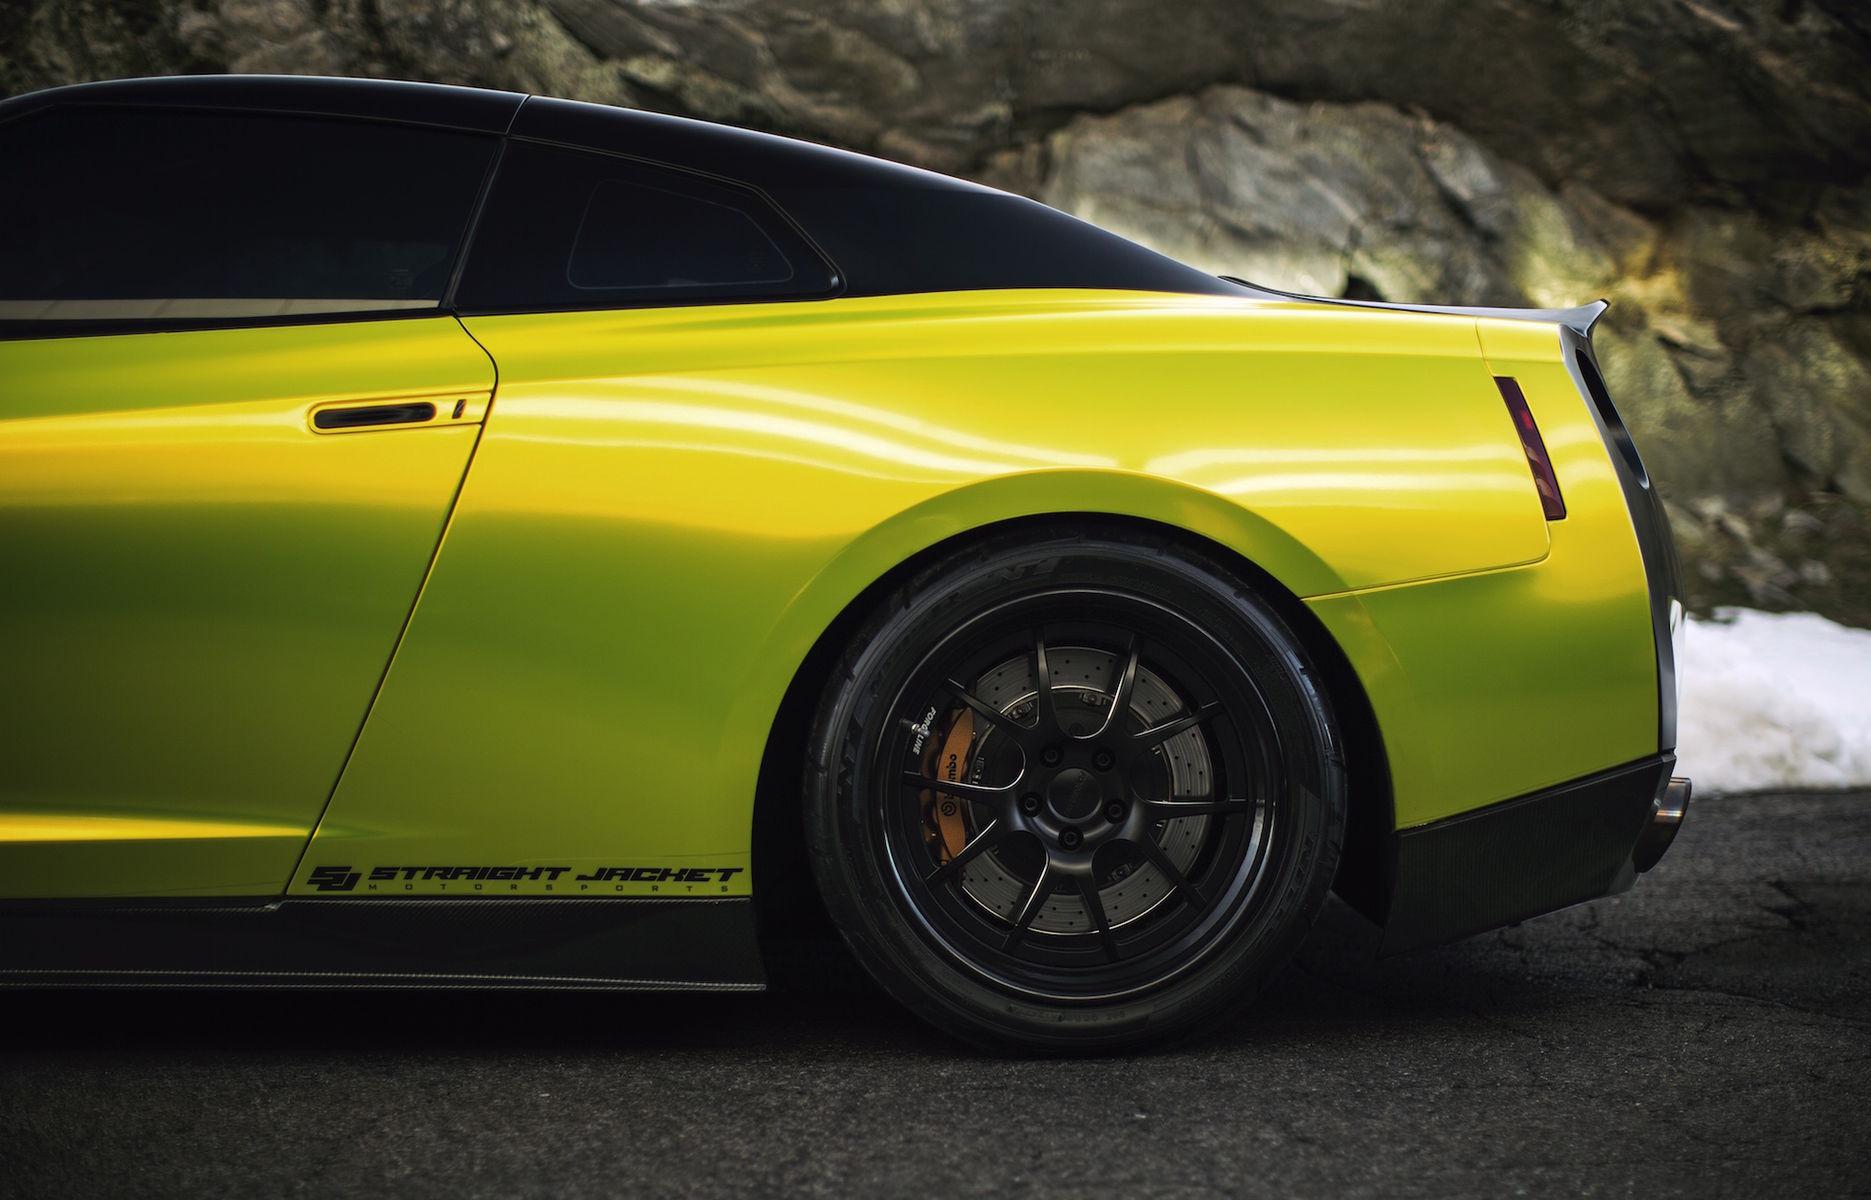 2009 Nissan GT-R | Greg's Alpha12-Powered